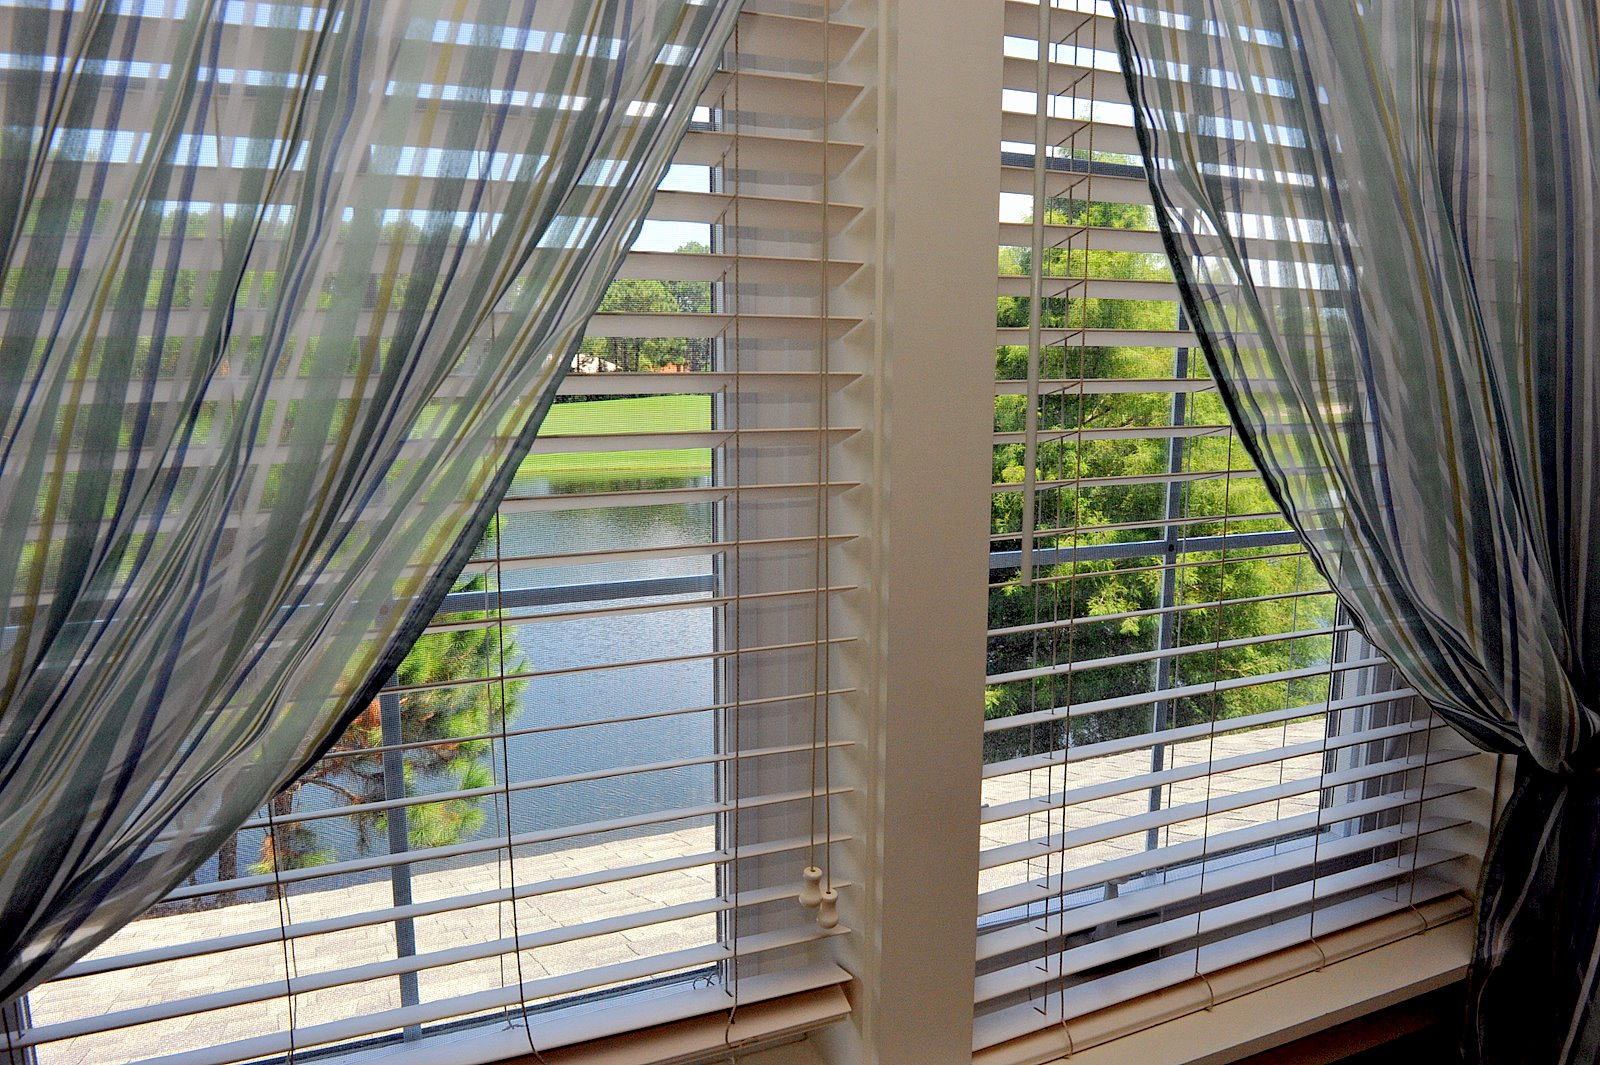 1280 Laurel Grove Condo rental in Sandestin Rentals ~ Cottages and Villas  in Destin Florida - #13